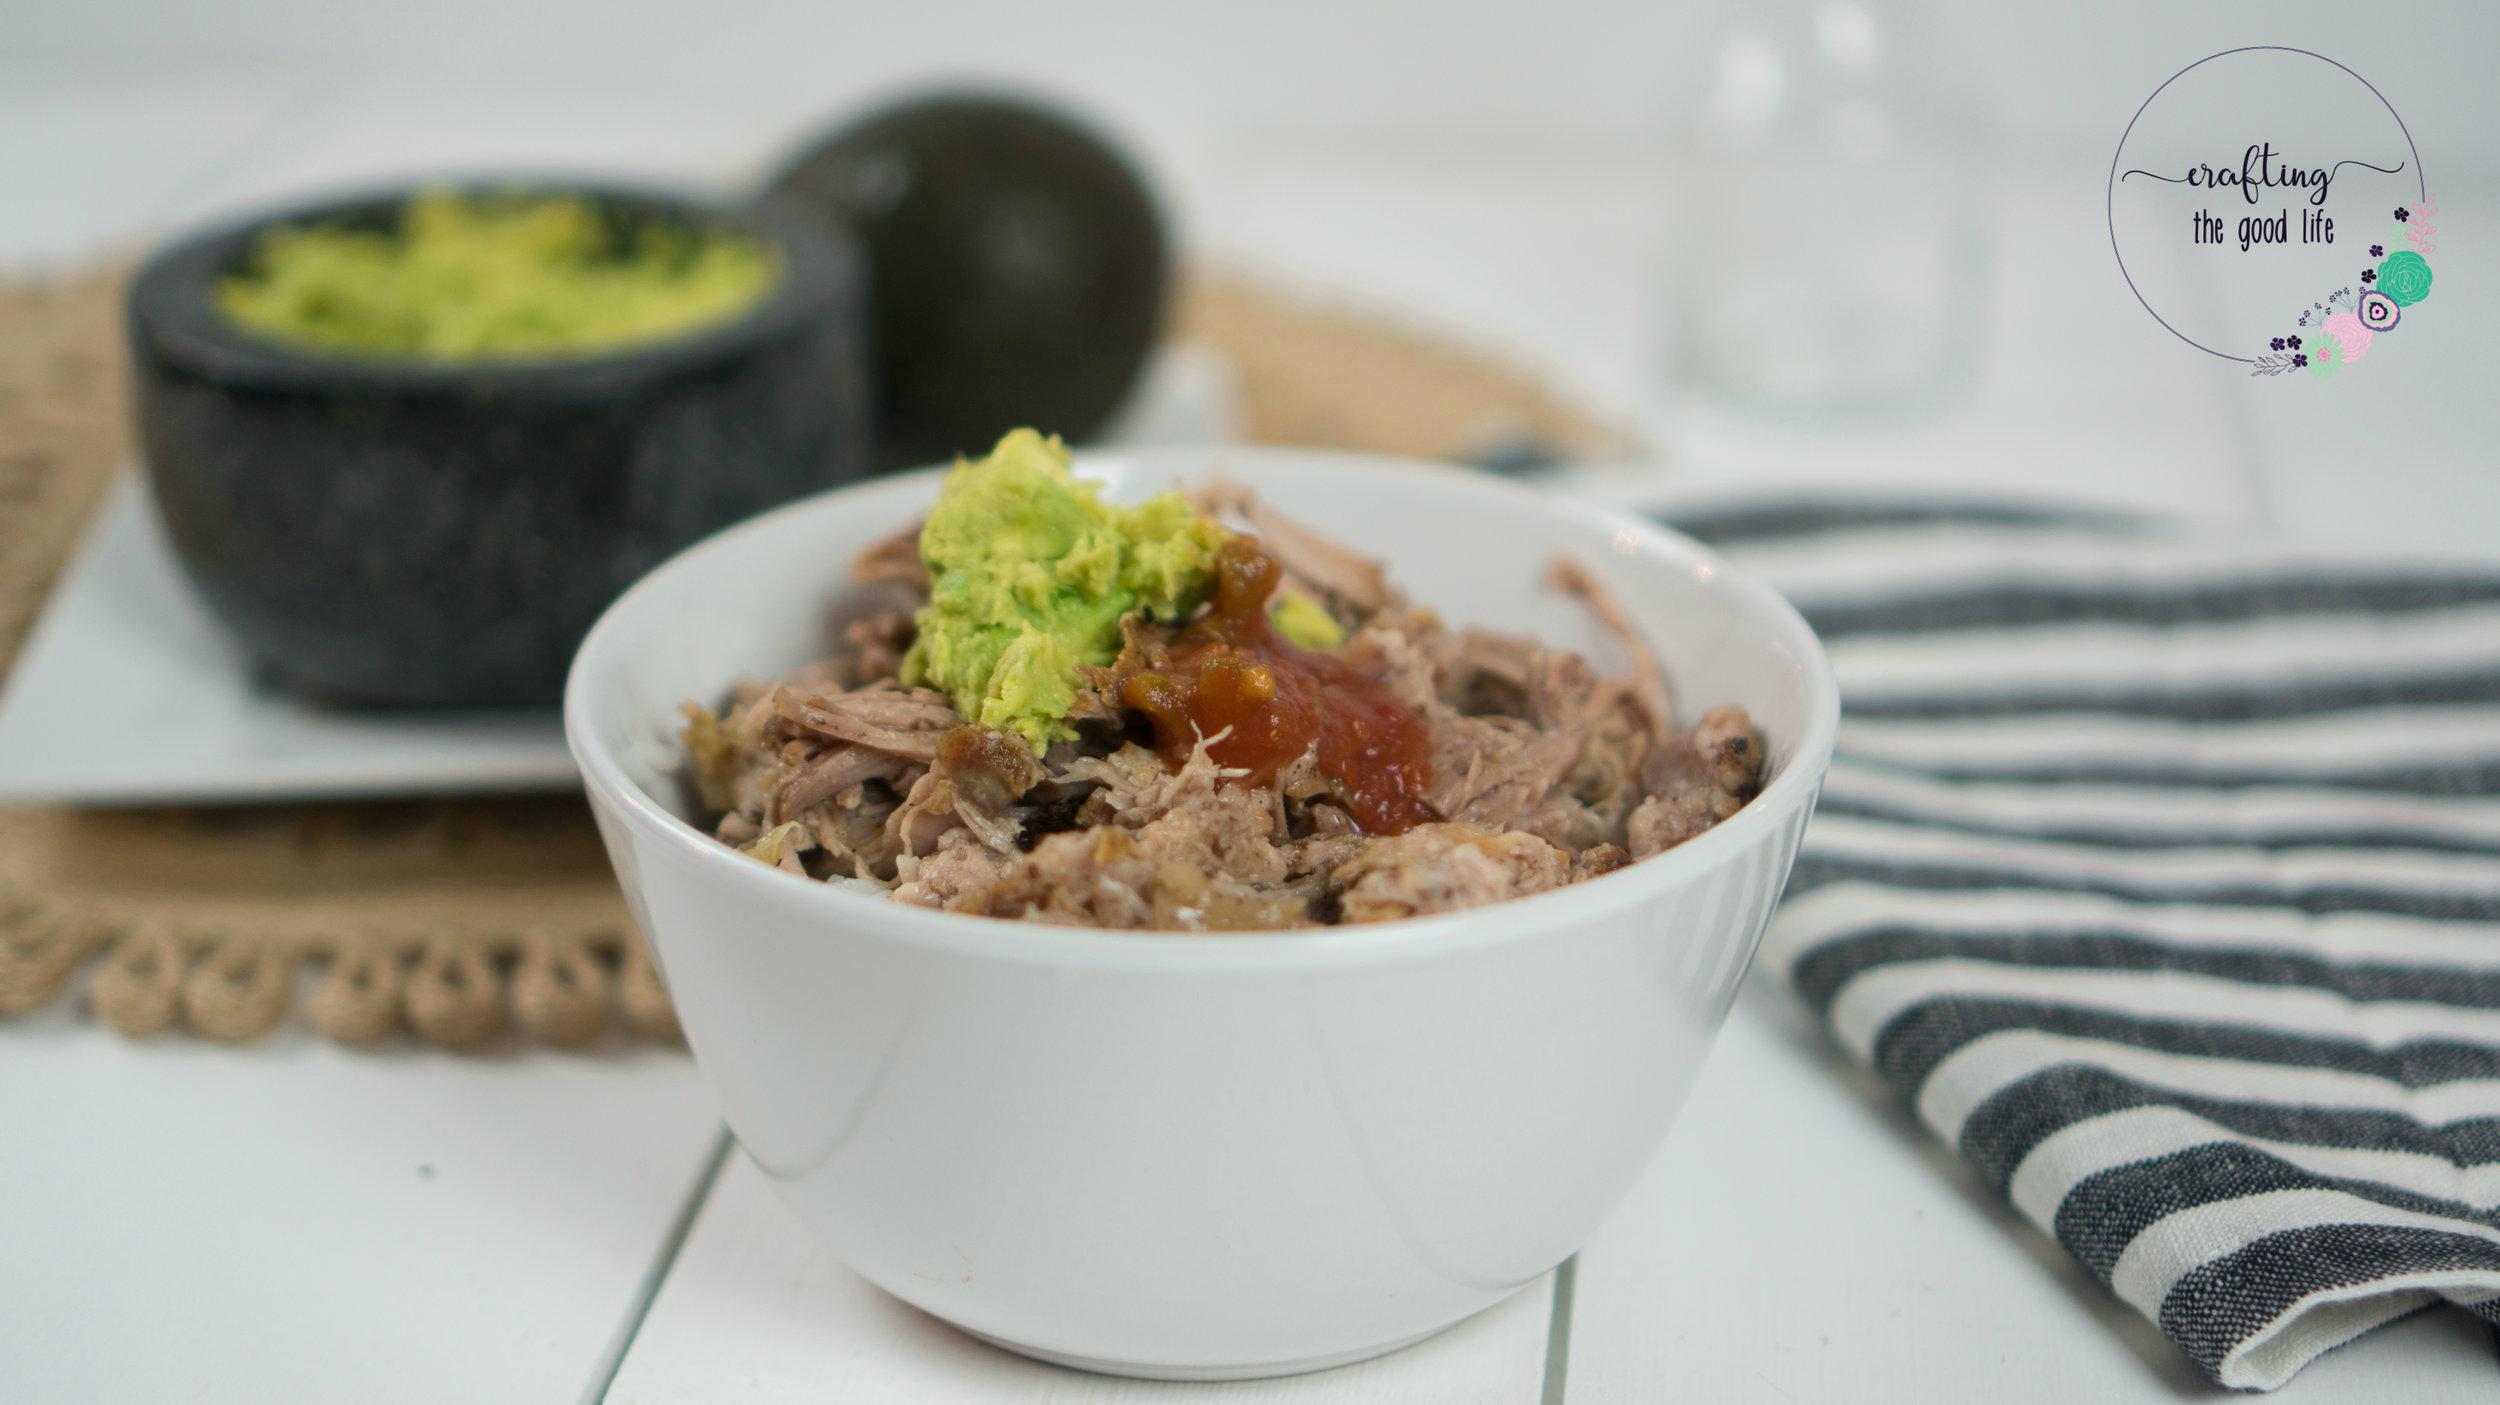 Slow-Cooker Pulled Pork Carnitas